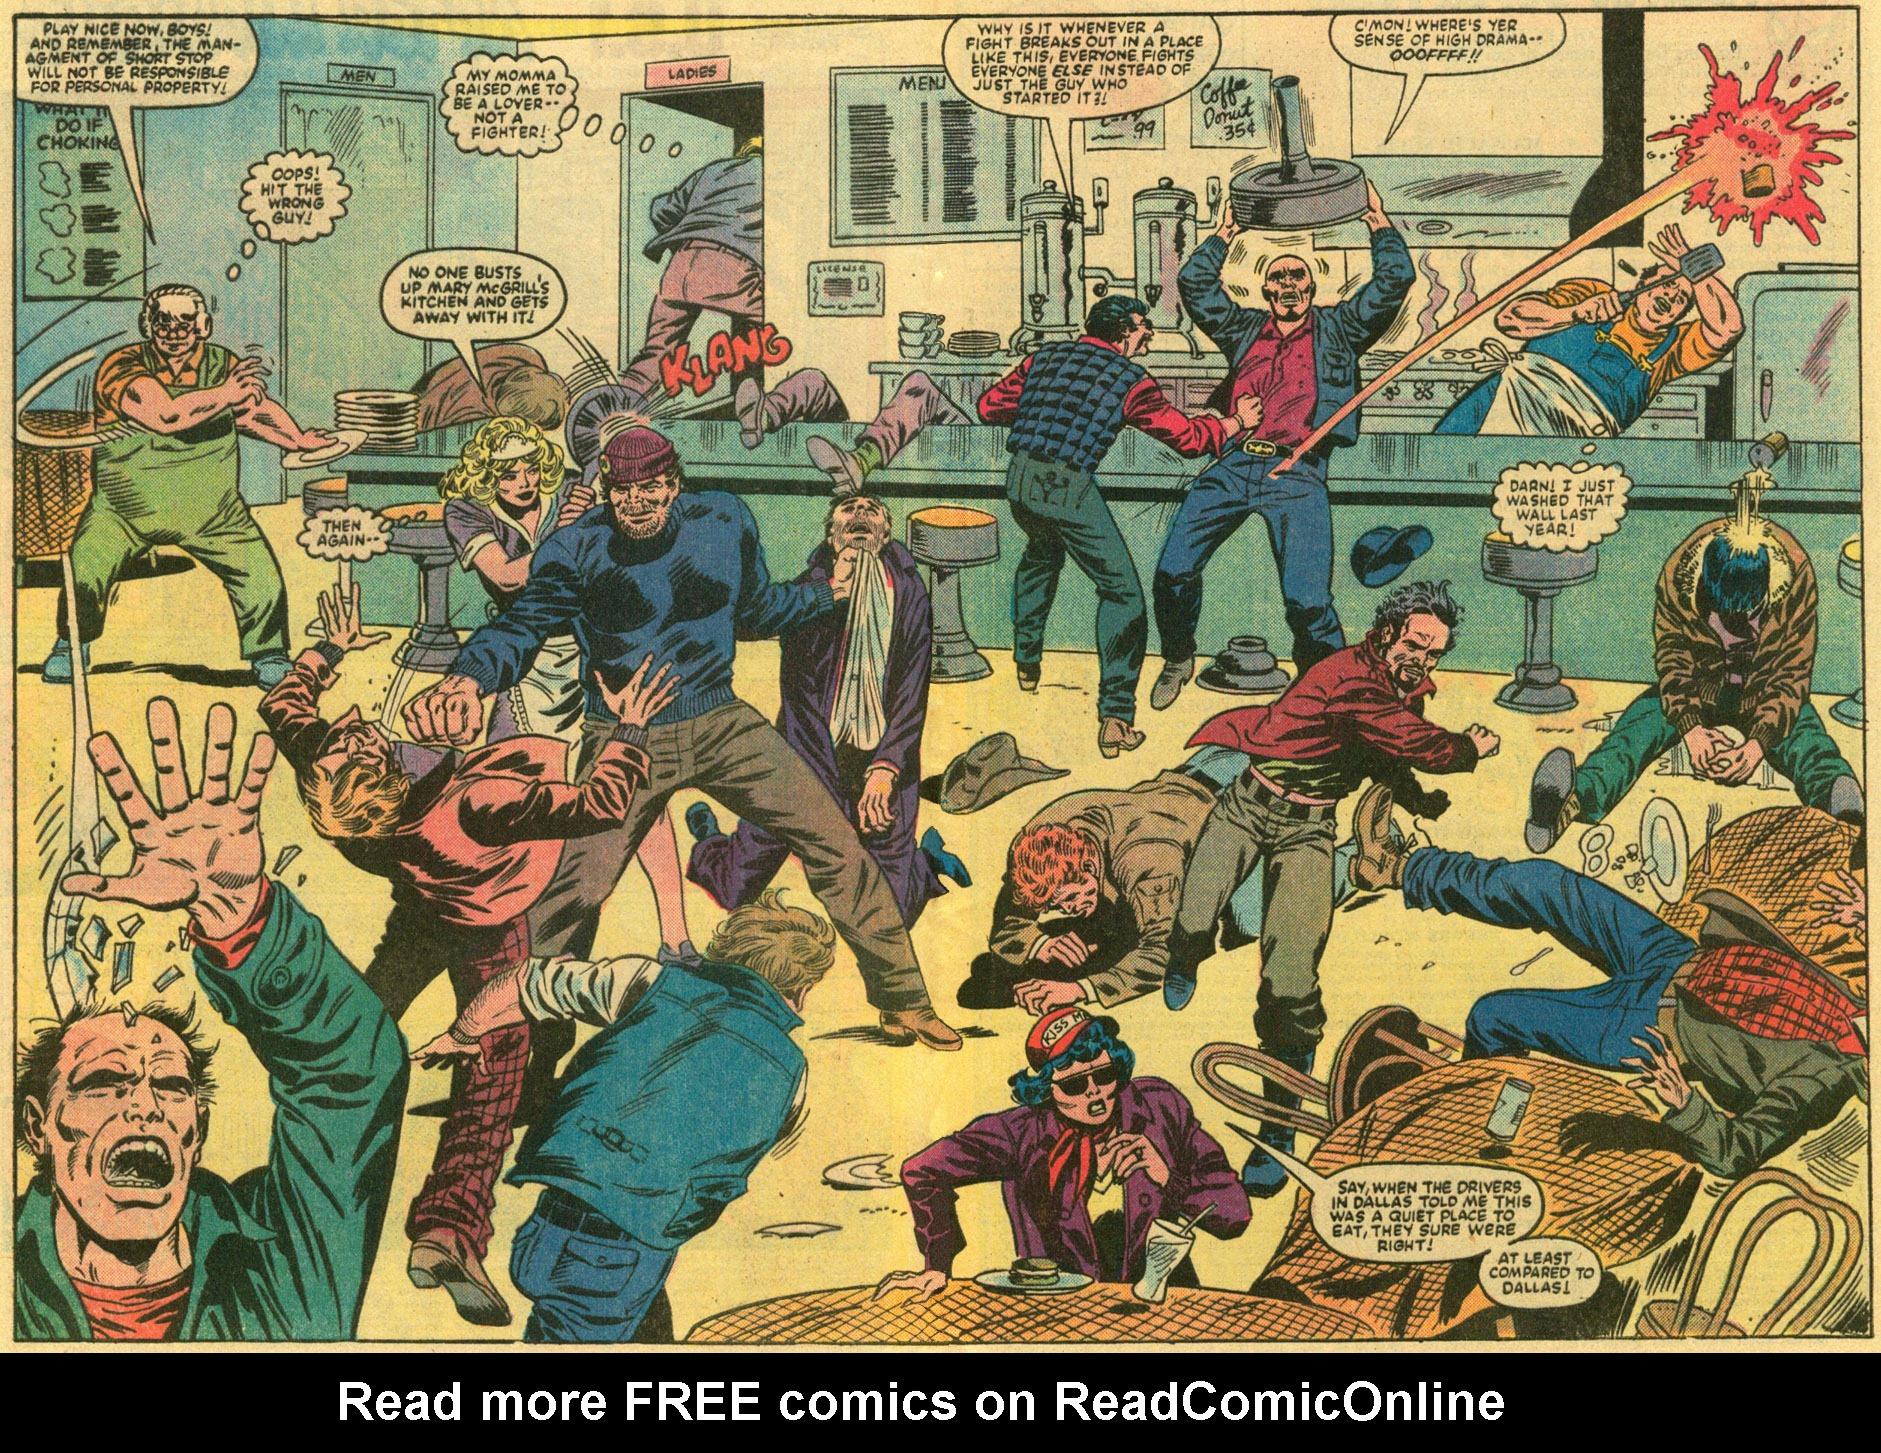 Read online U.S. 1 comic -  Issue #2 - 3